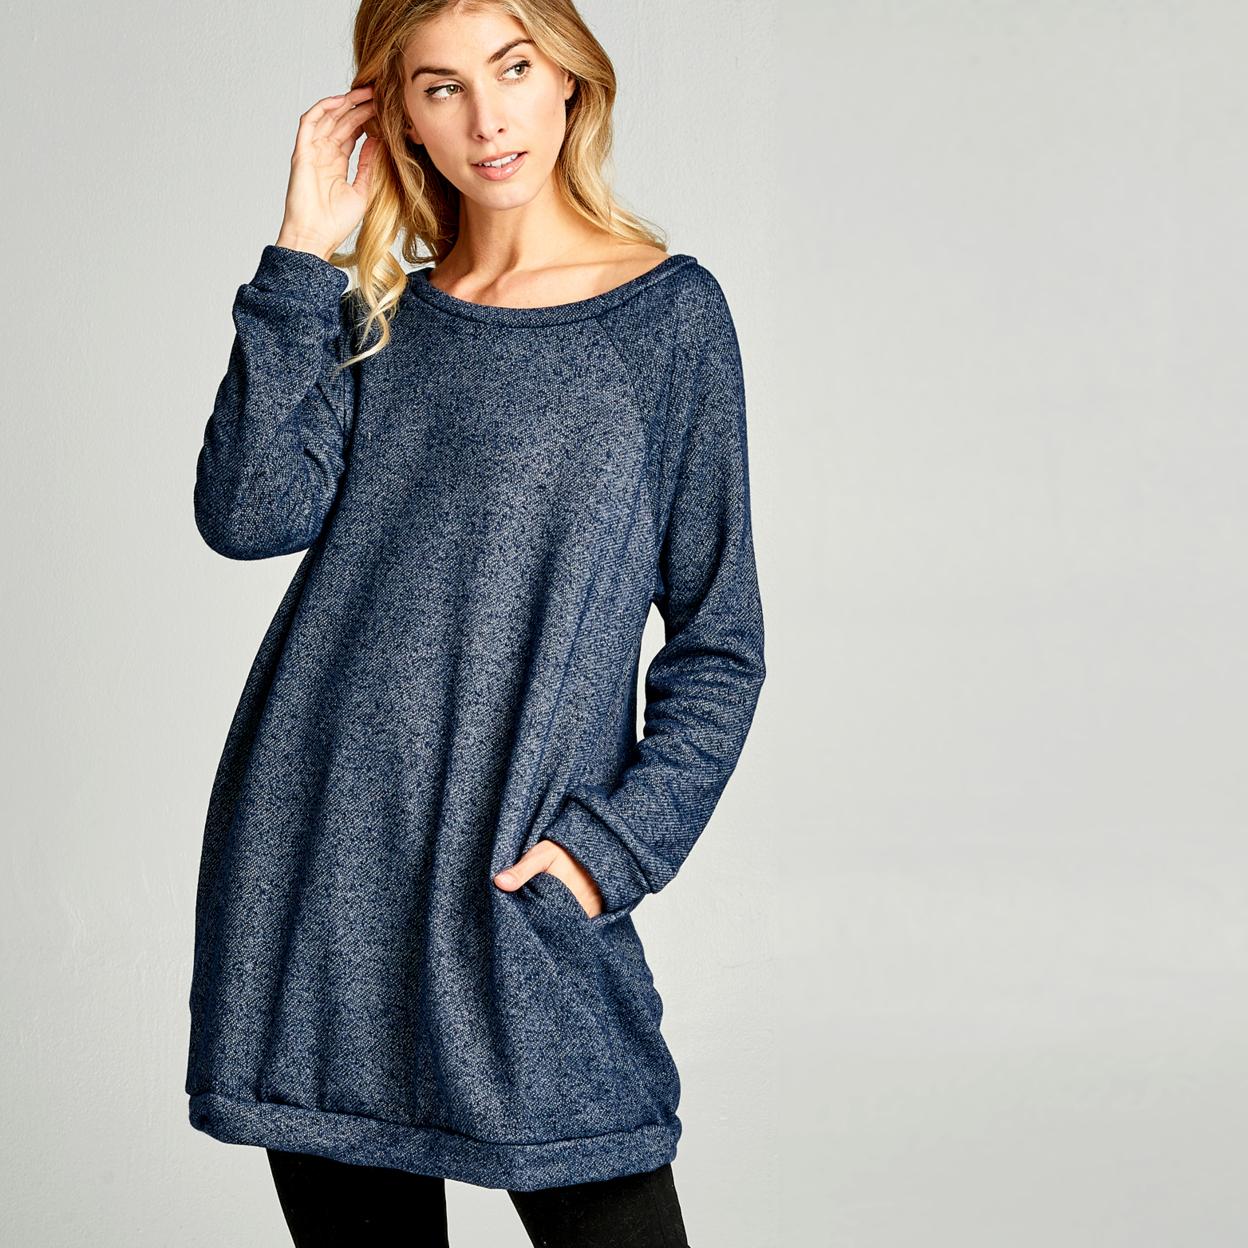 Chunky French Terry Sweatshirt Dress - Heather Black, Small (2-6) 59b9a62999336a468139cf20